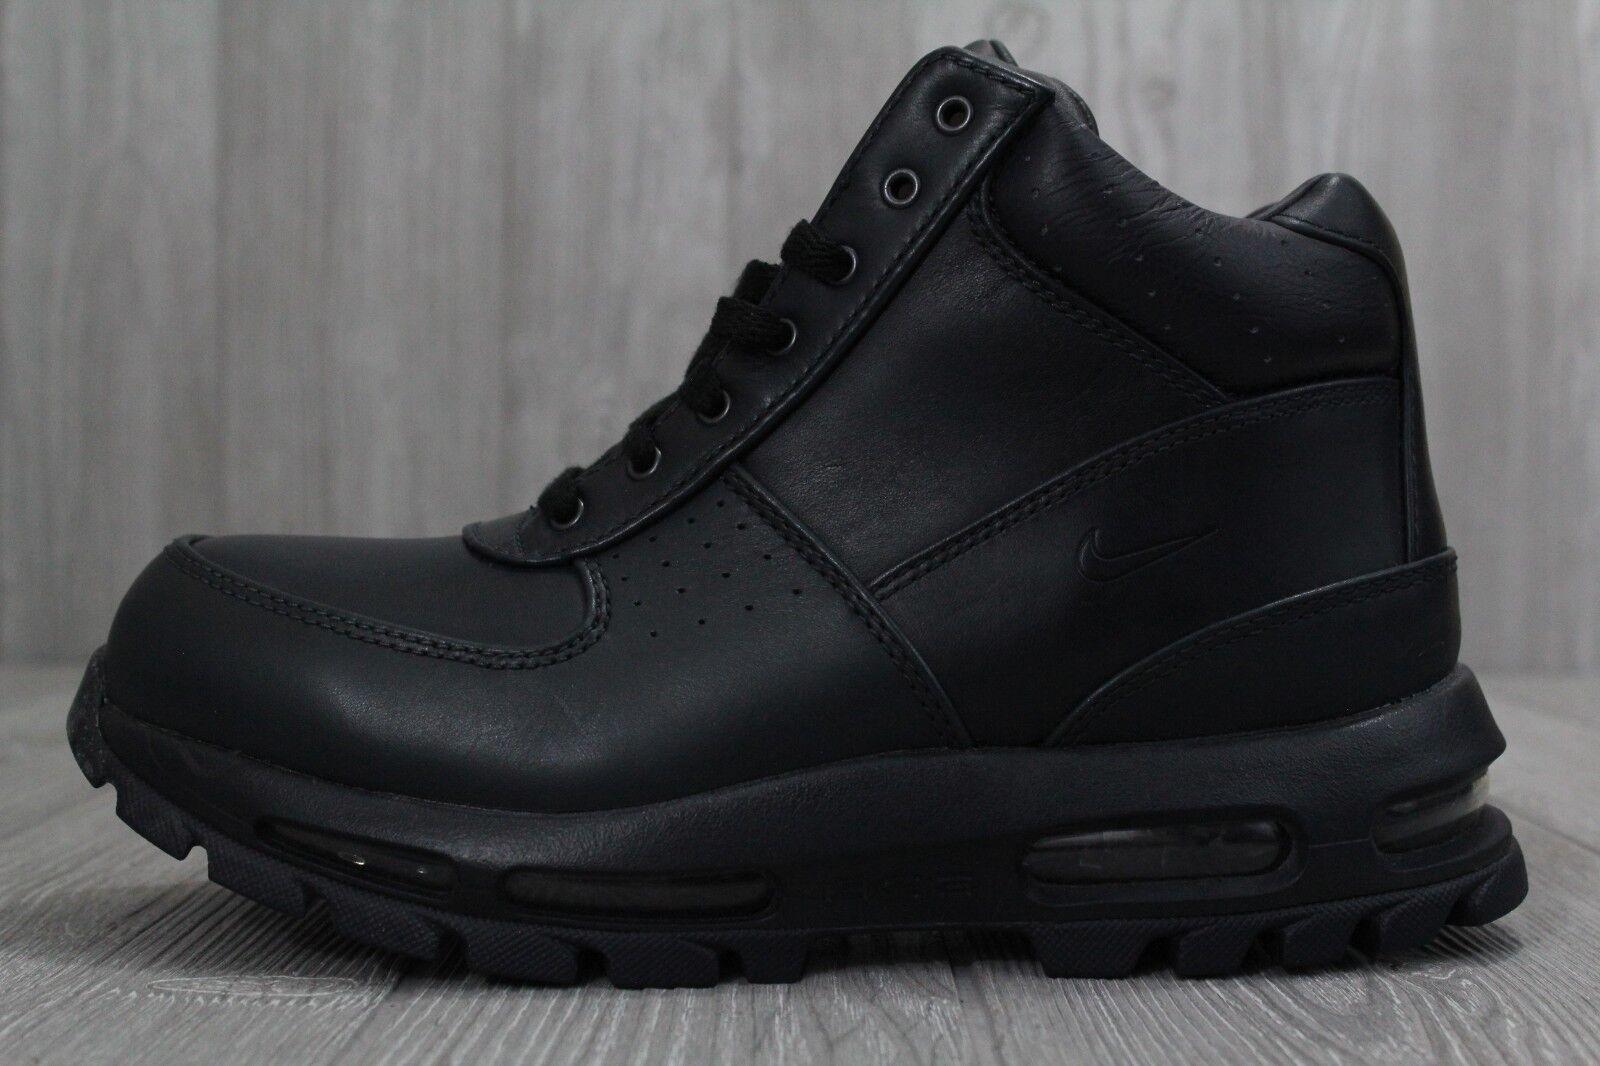 c4f266e9e5a ... sale nike acg boots air max goadome hombre boots acg dark obsidian azul  negro 865031 403 ...